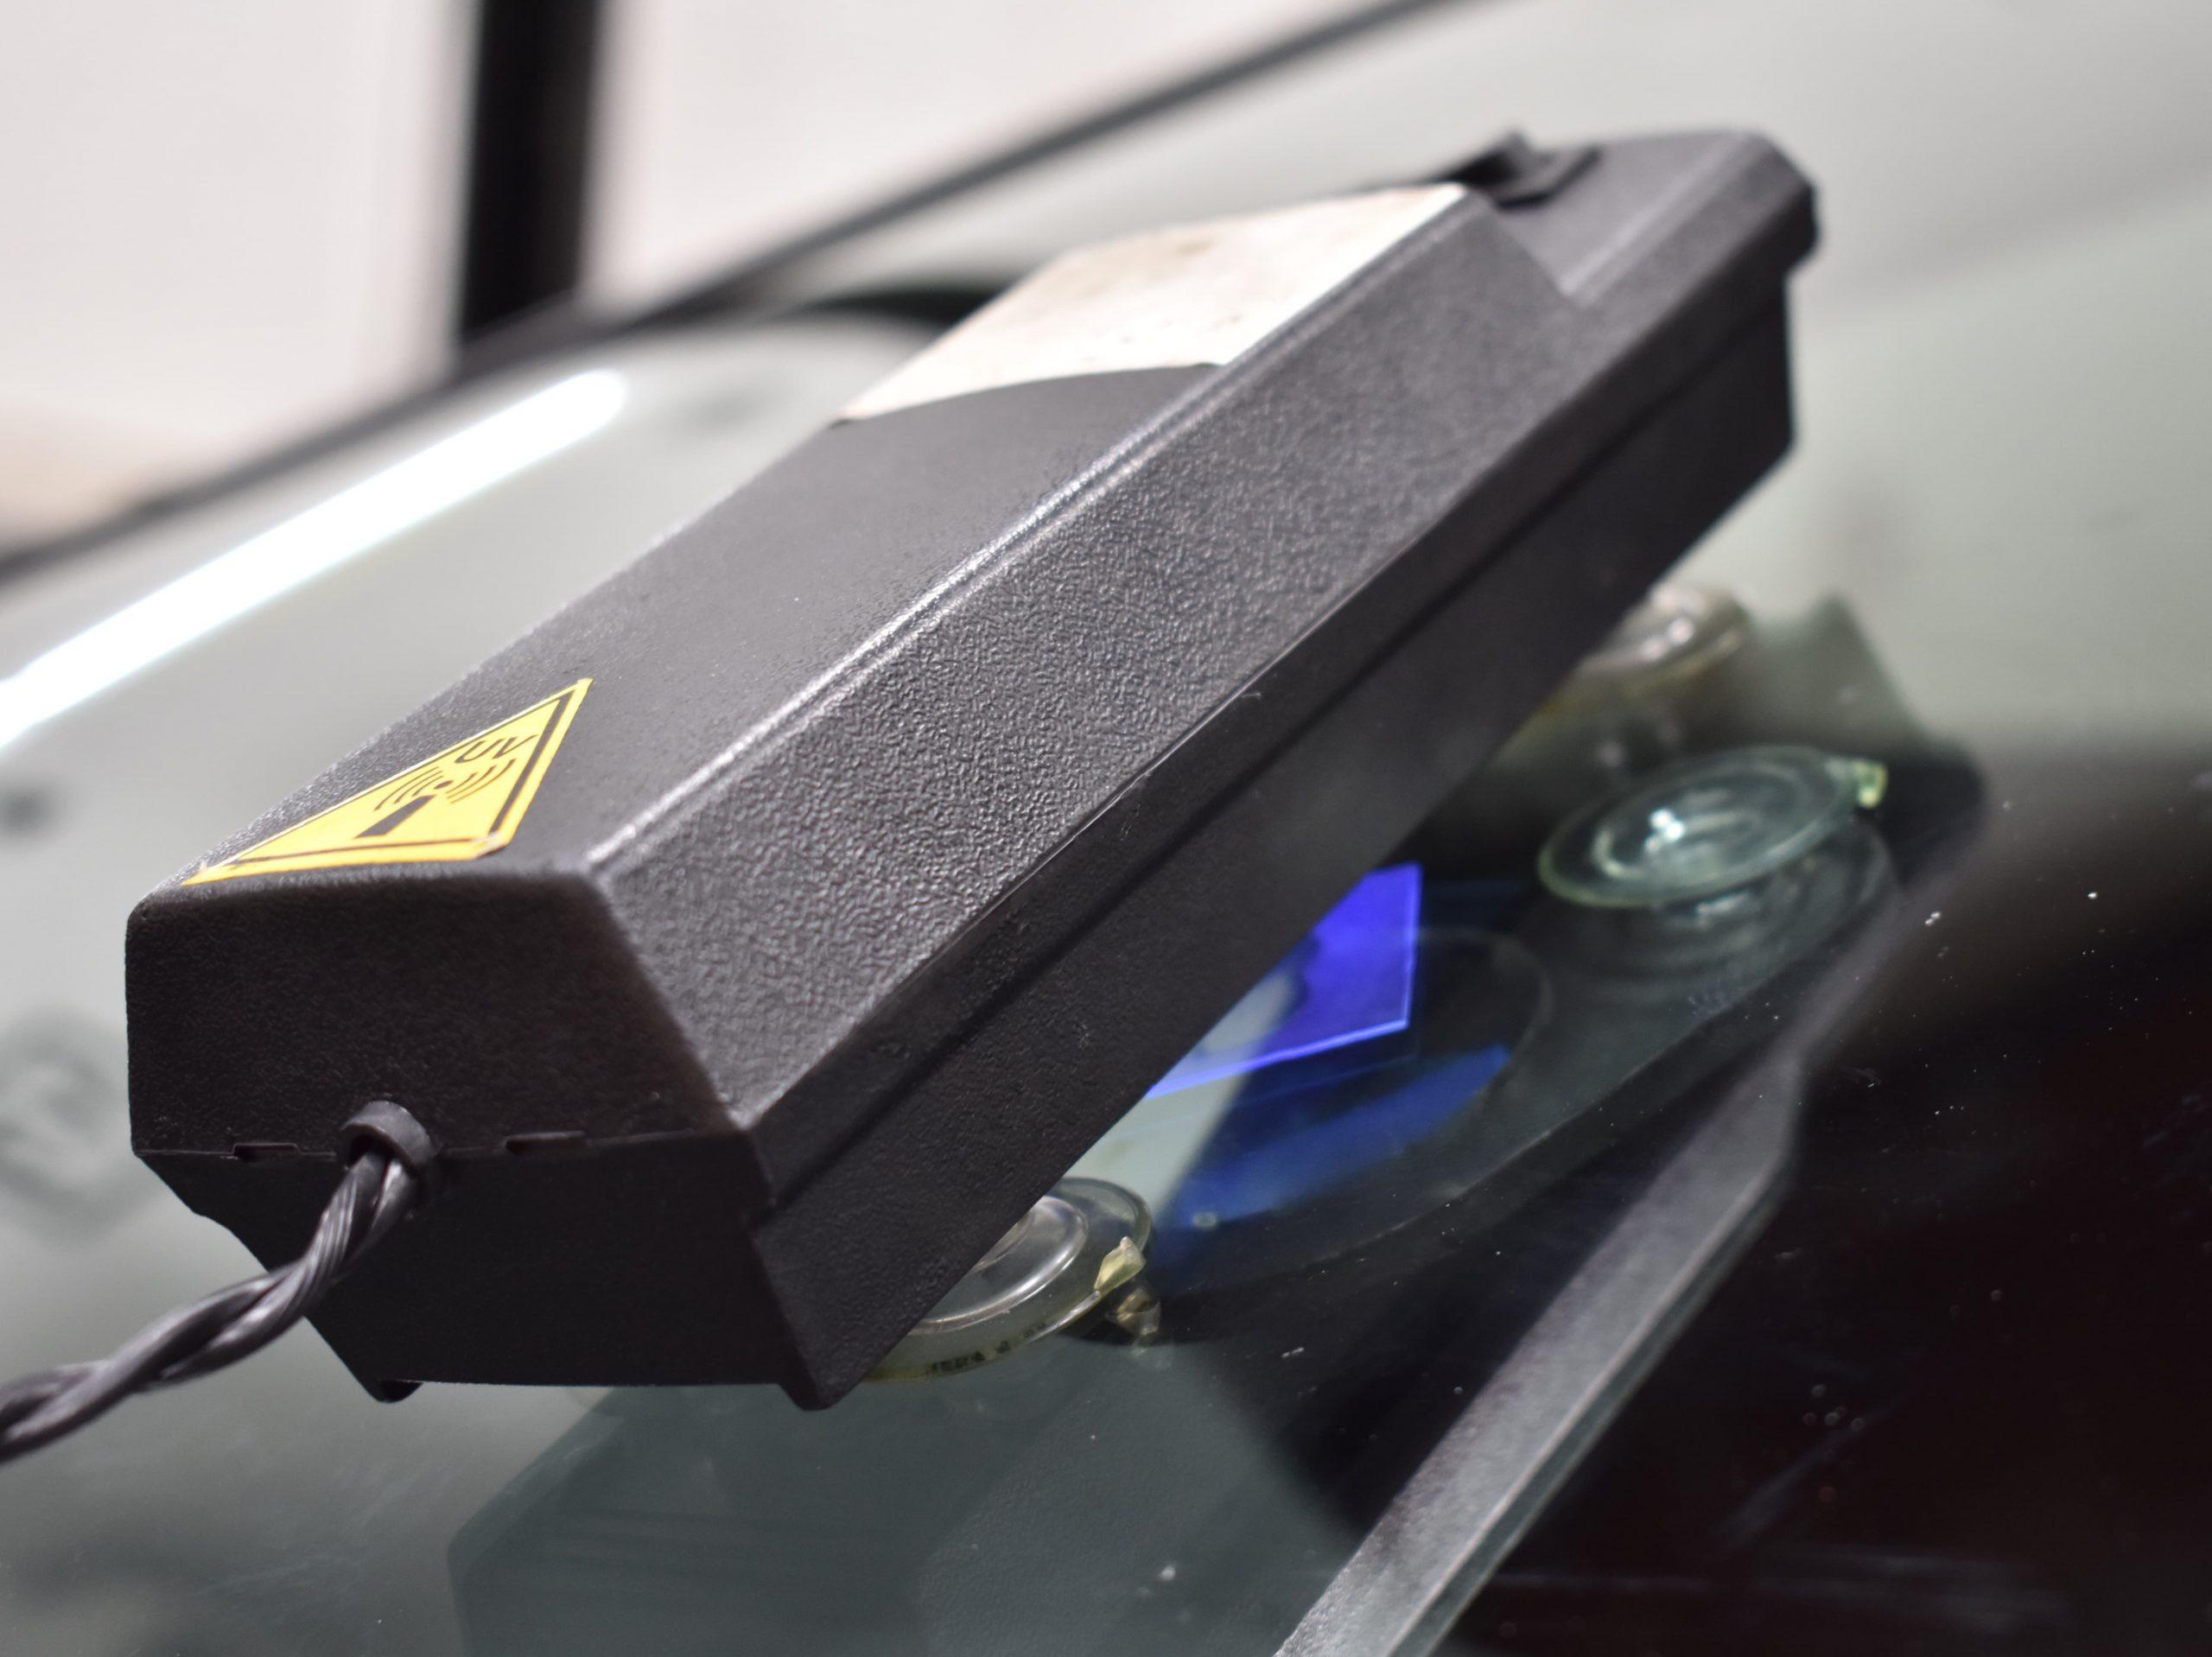 windshield chip repair - uv light